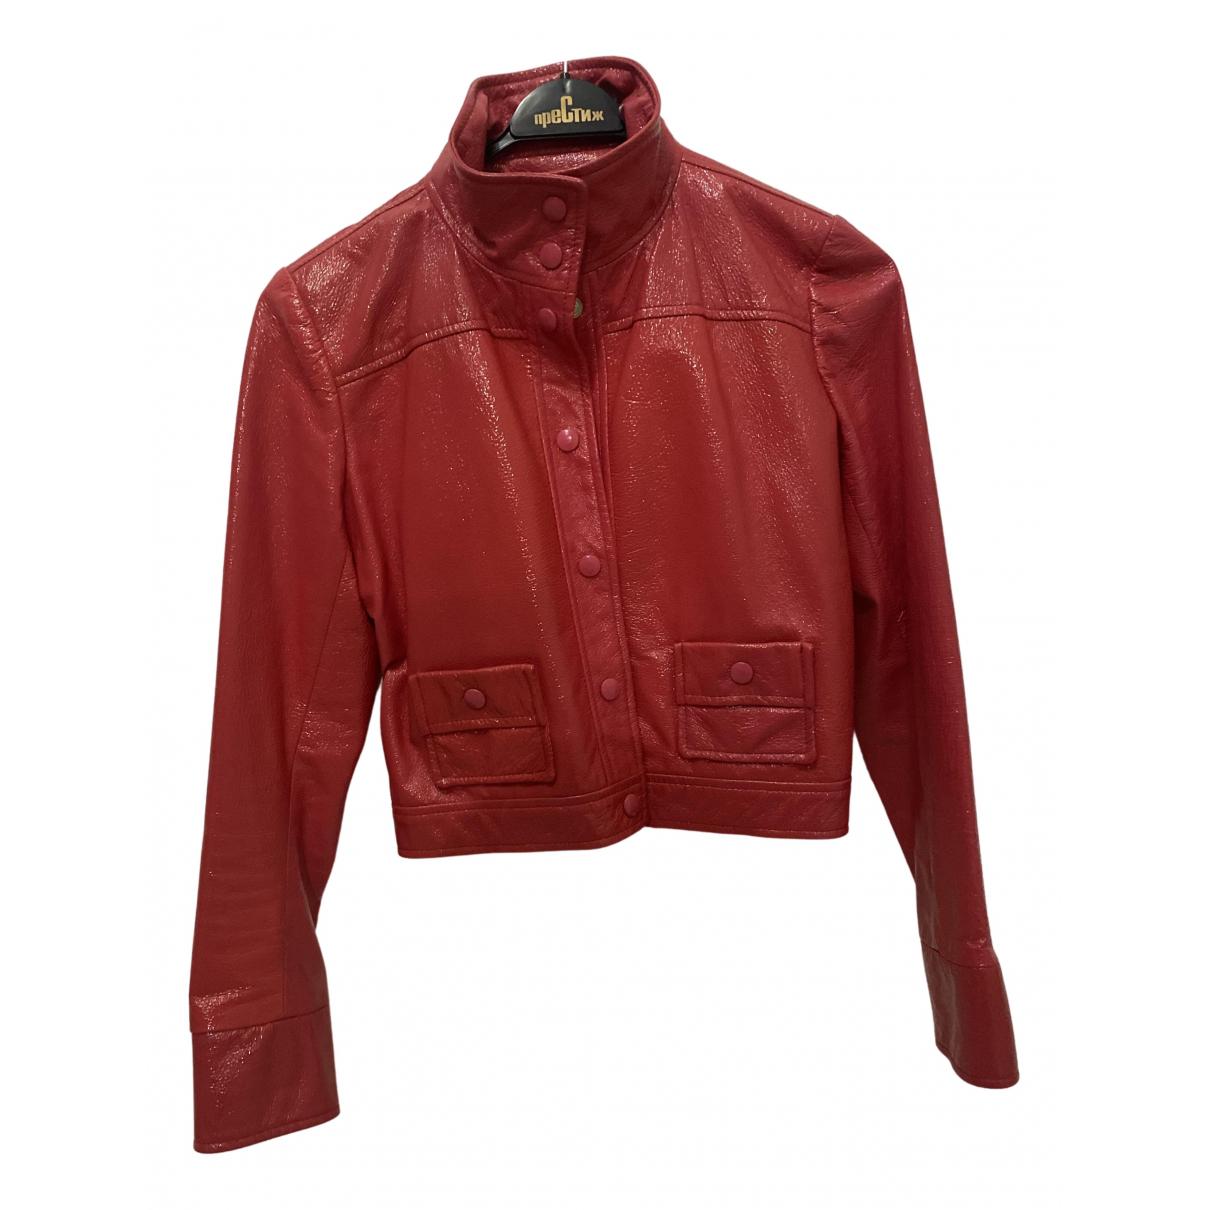 Lisa Perry N Pink jacket for Women 2 US